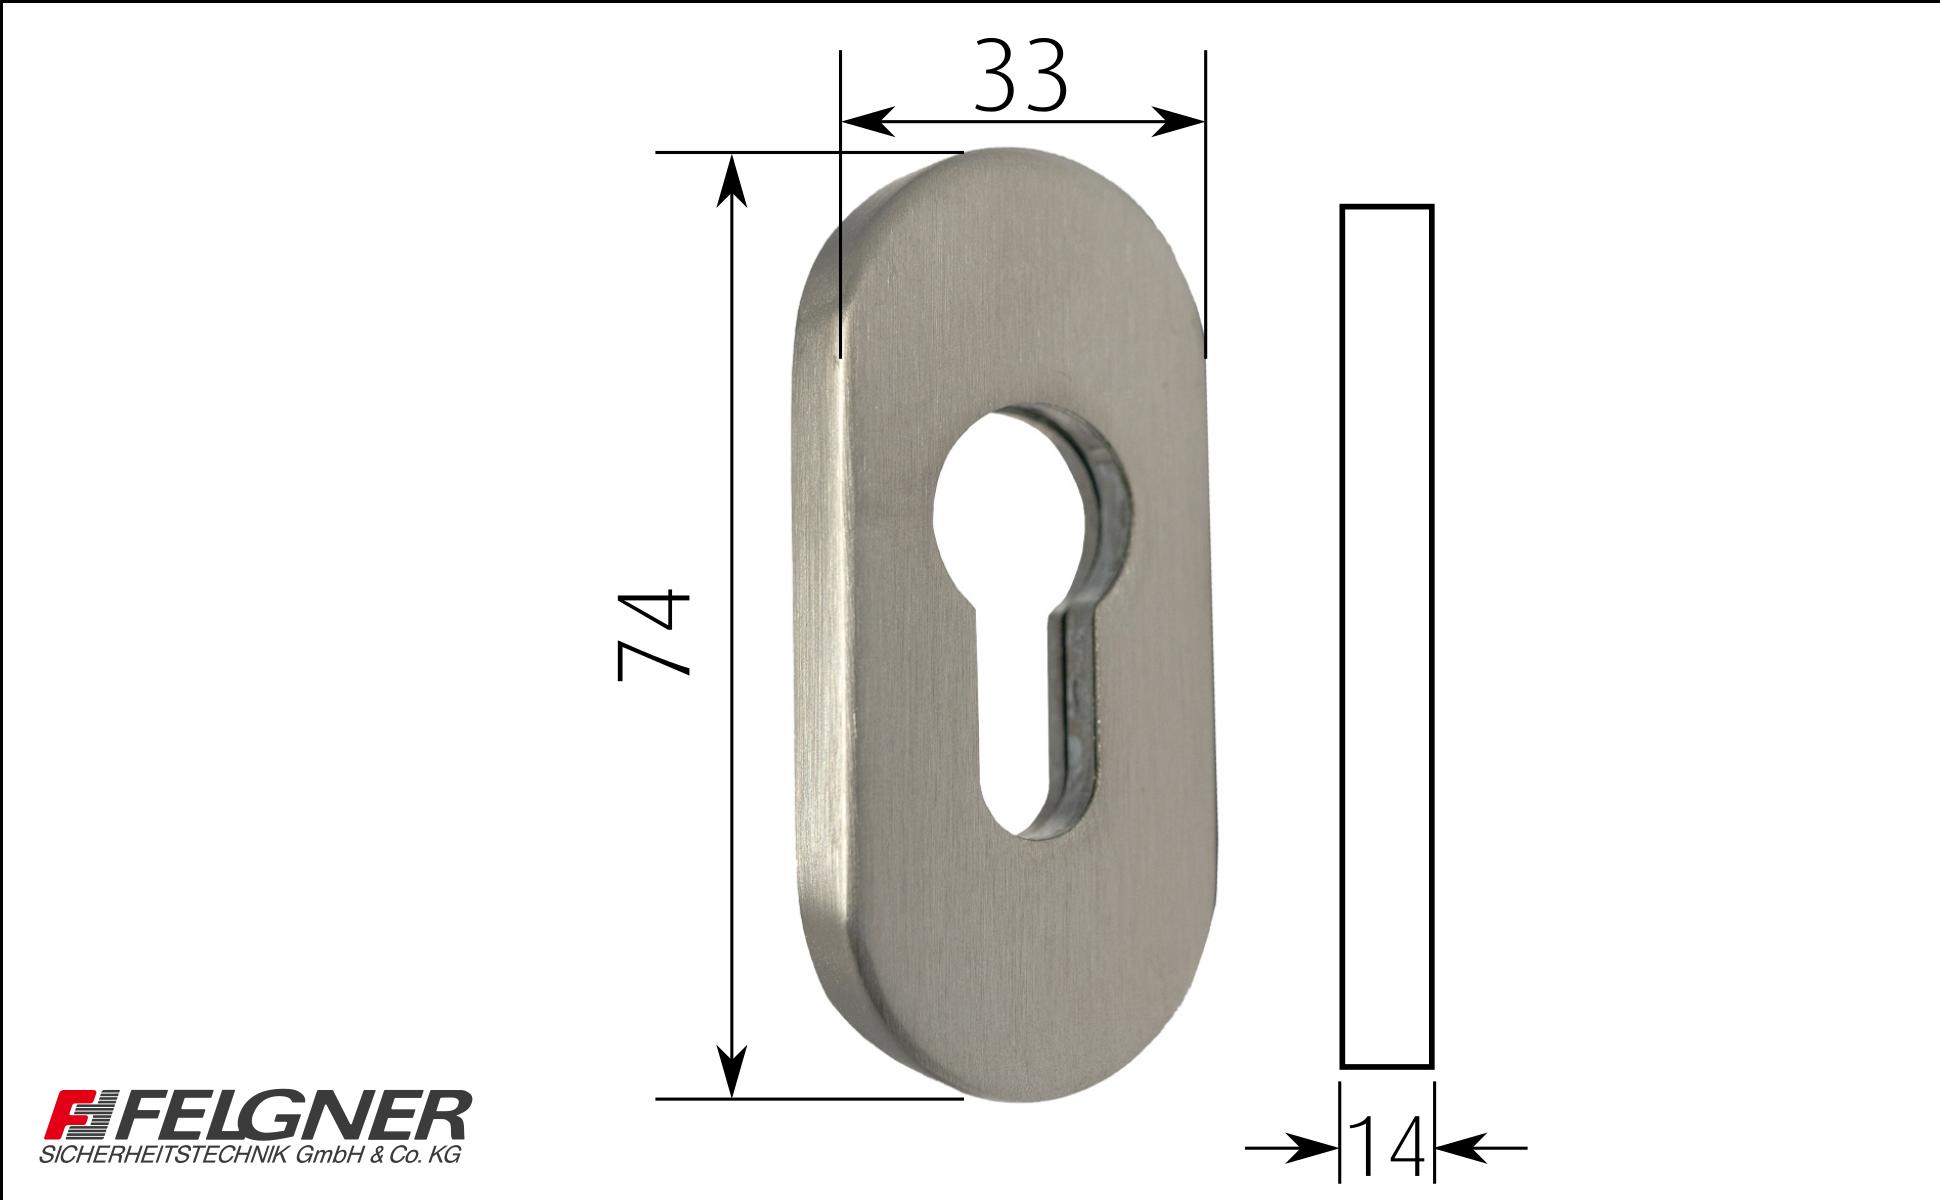 FELGNER Schutzrosetten Tür Sicherheit